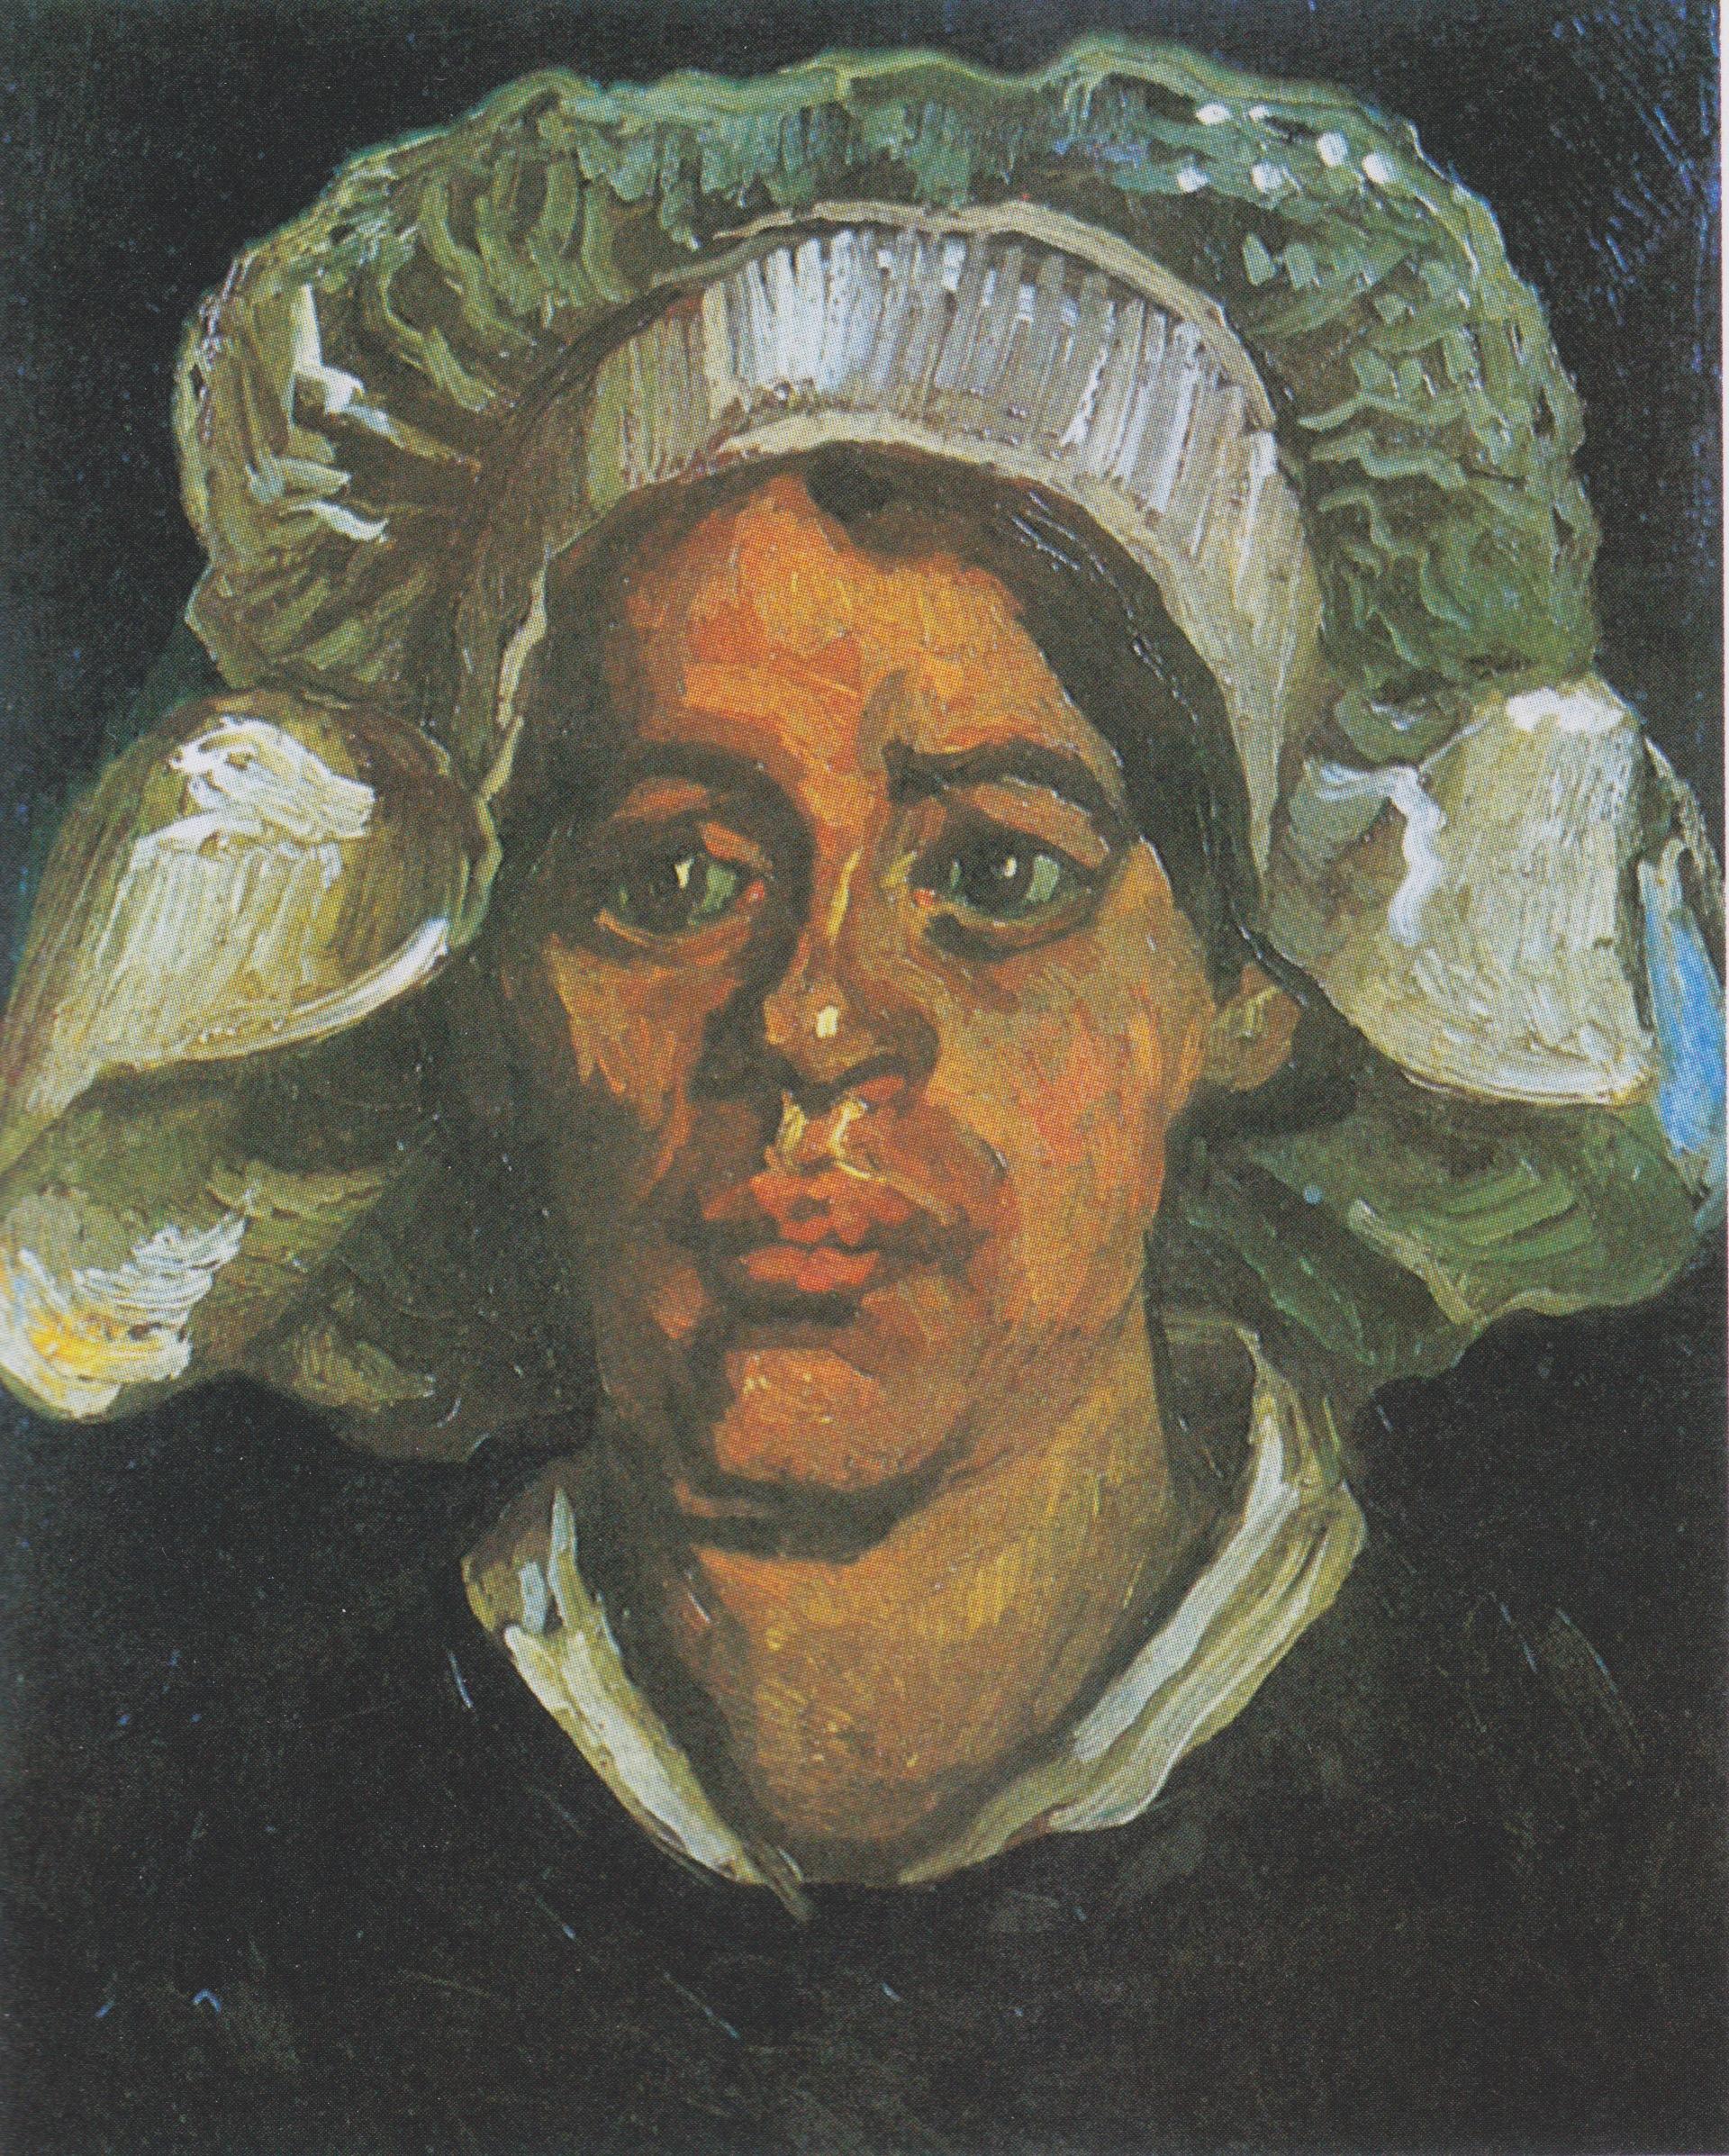 فينسنت فان جوخ، رسم